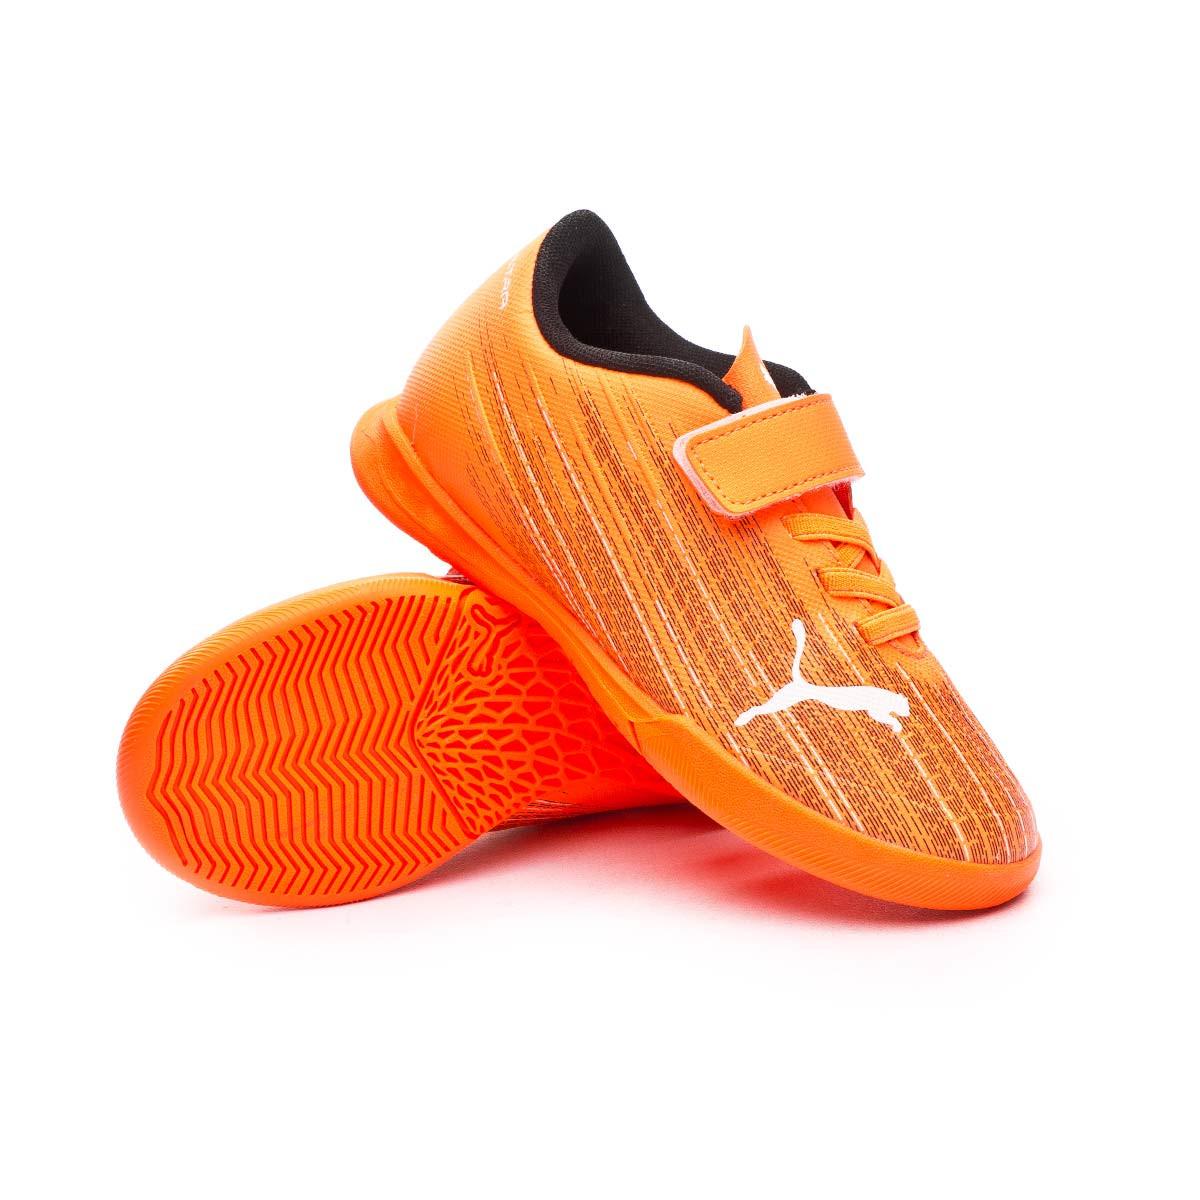 Chaussure de futsal Puma Ultra 4.1 IT Cinta Adhesiva Niño Shocking ...